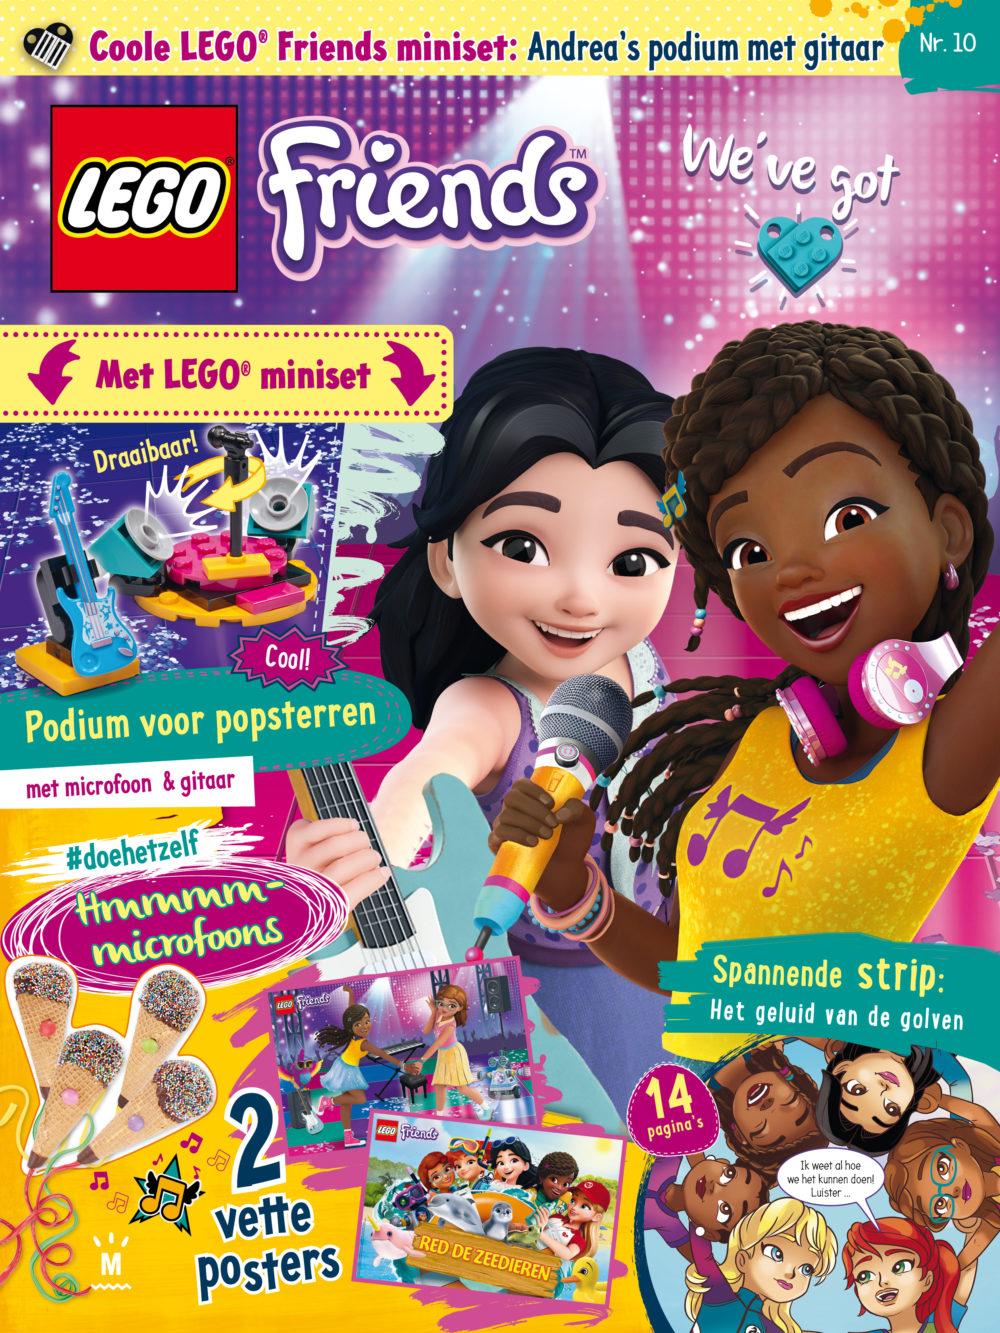 LEGO FRIENDS magazine 10 2019